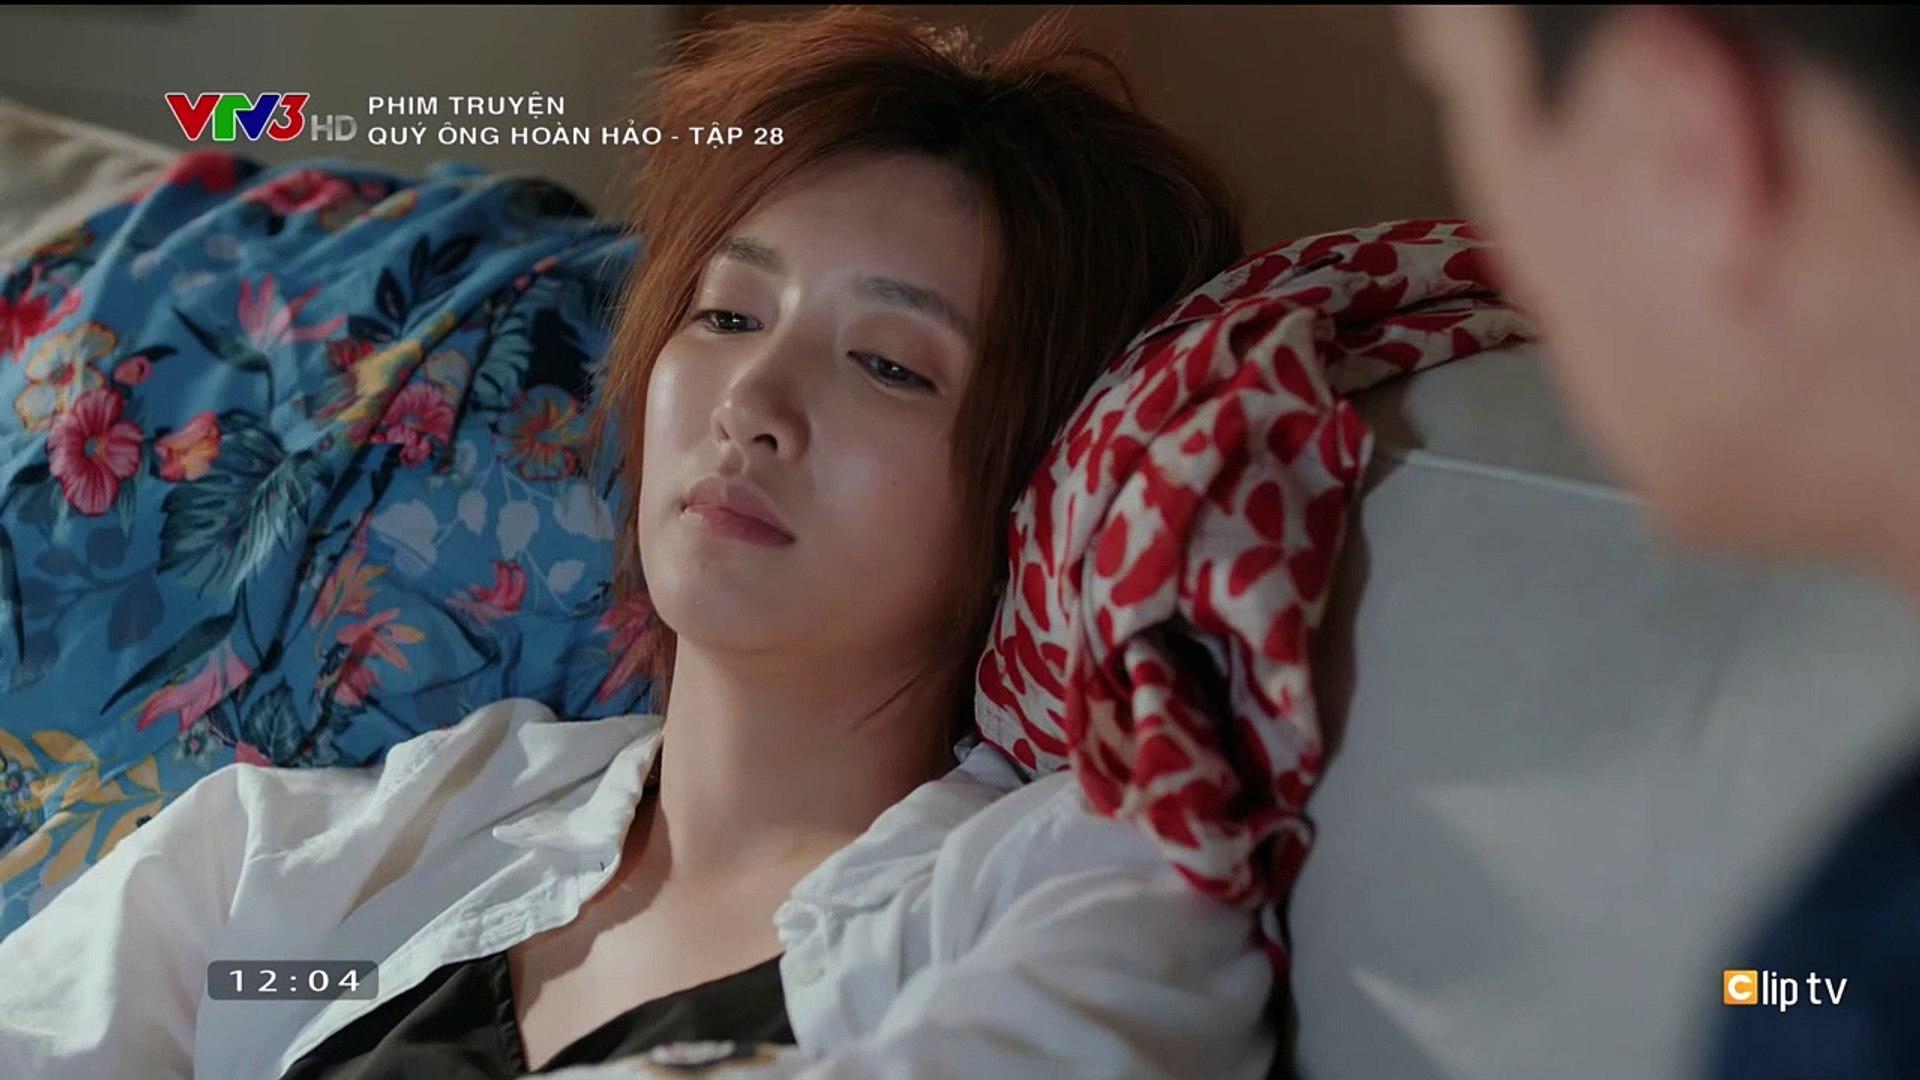 Phim-quy-ong-hoan-hao-phat-song-tren-kenh-VTV3-bat-dau-tu-ngay-28-1-2020